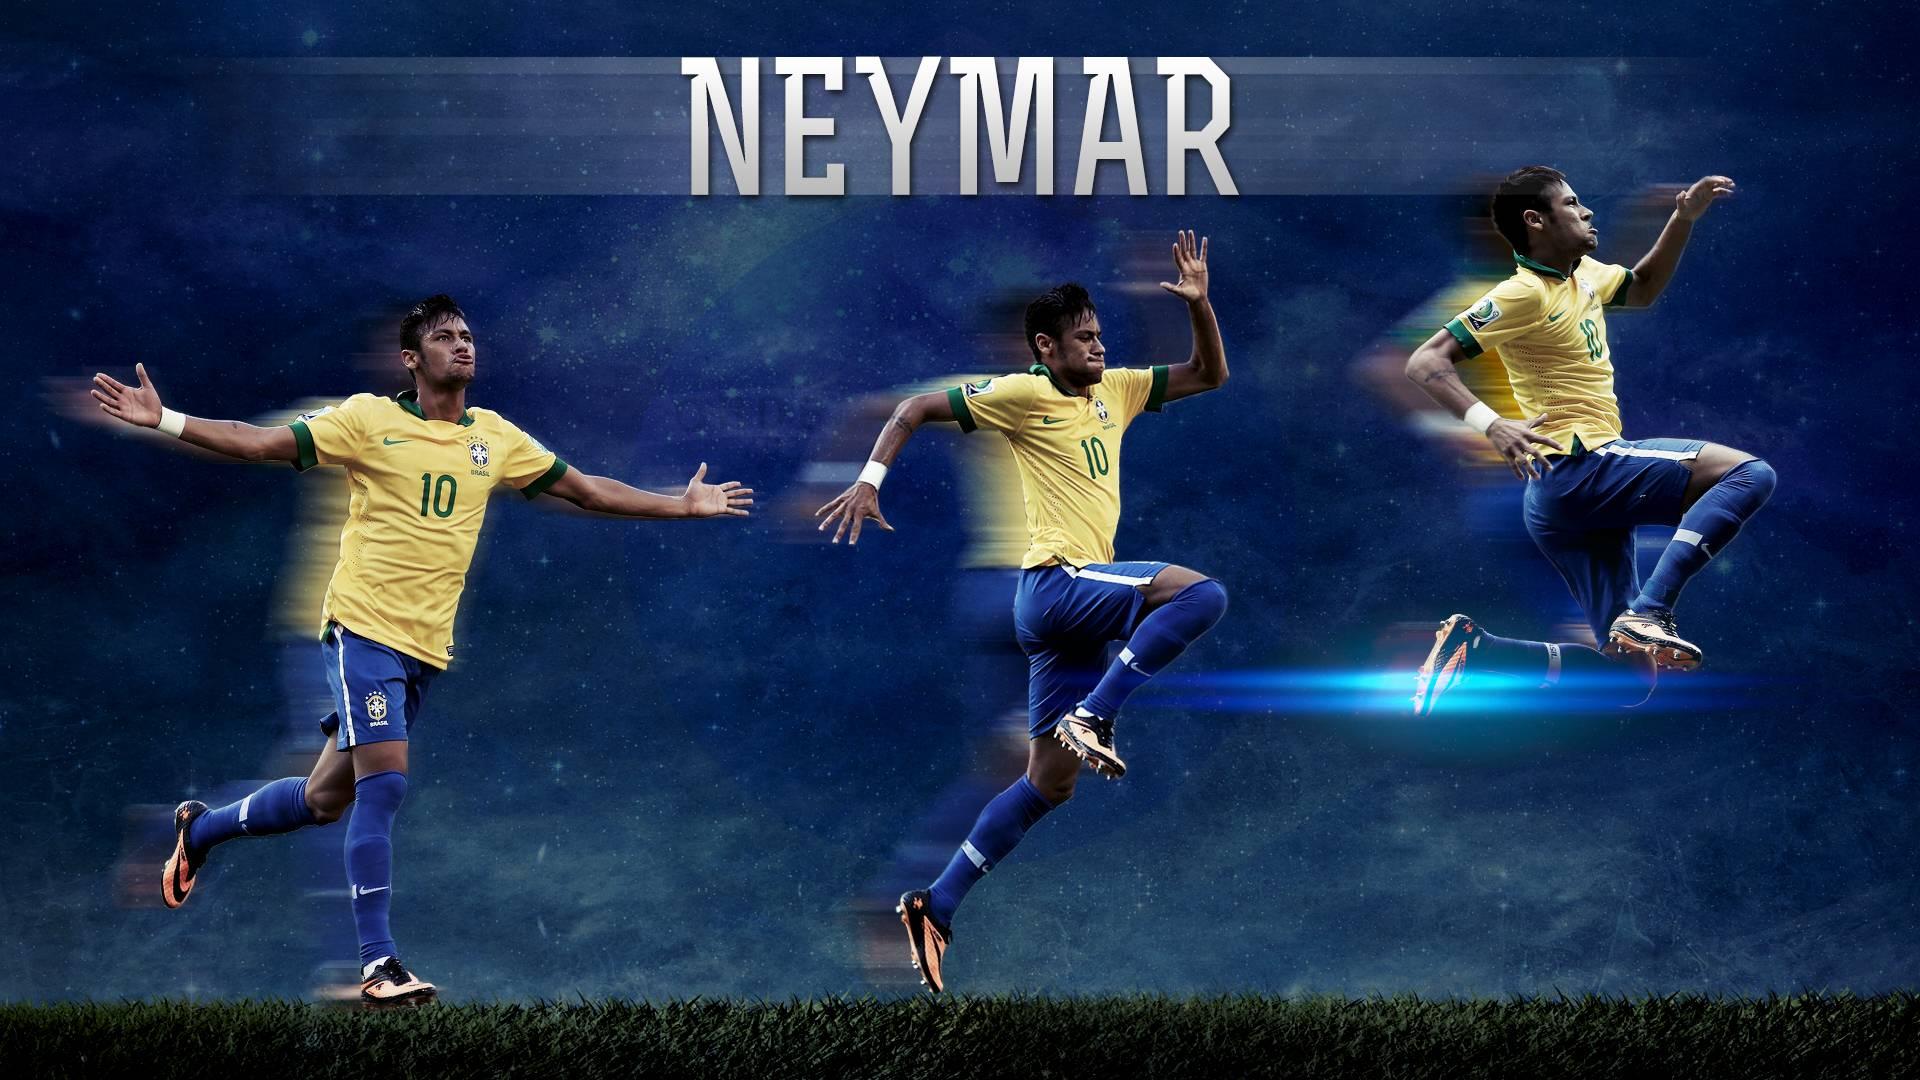 49+ Neymar Jr Wallpaper HD on WallpaperSafari